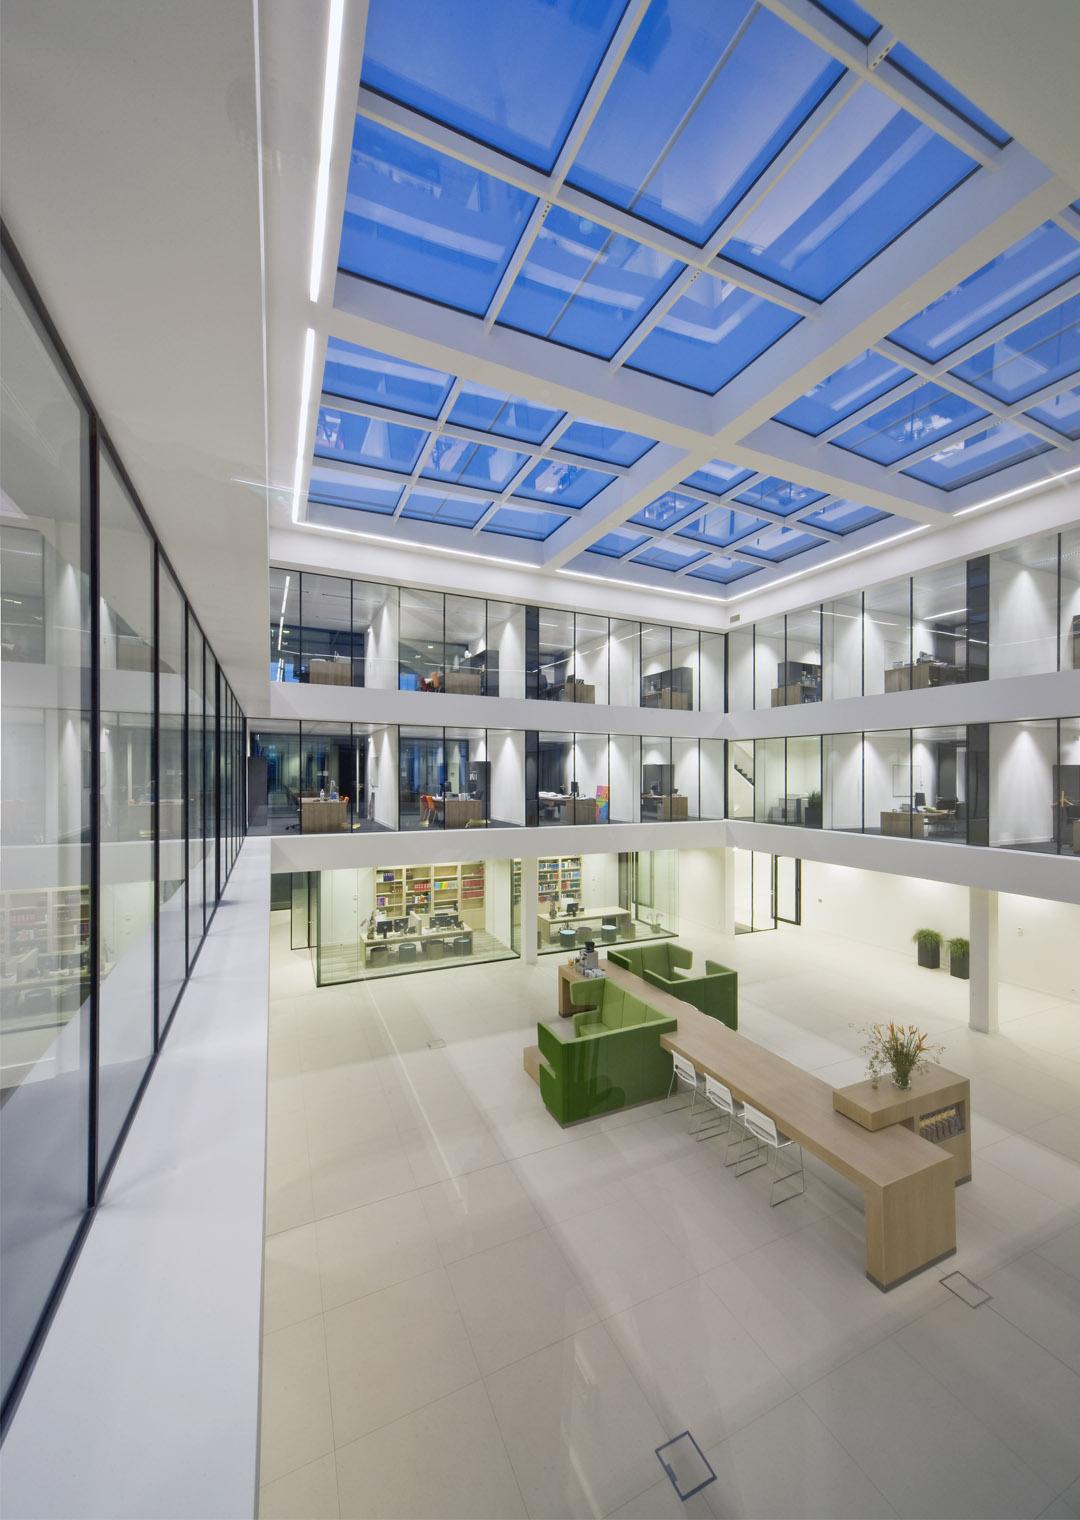 Steel glazed indoor walls at WVDB office building, Waalre the Netherlands